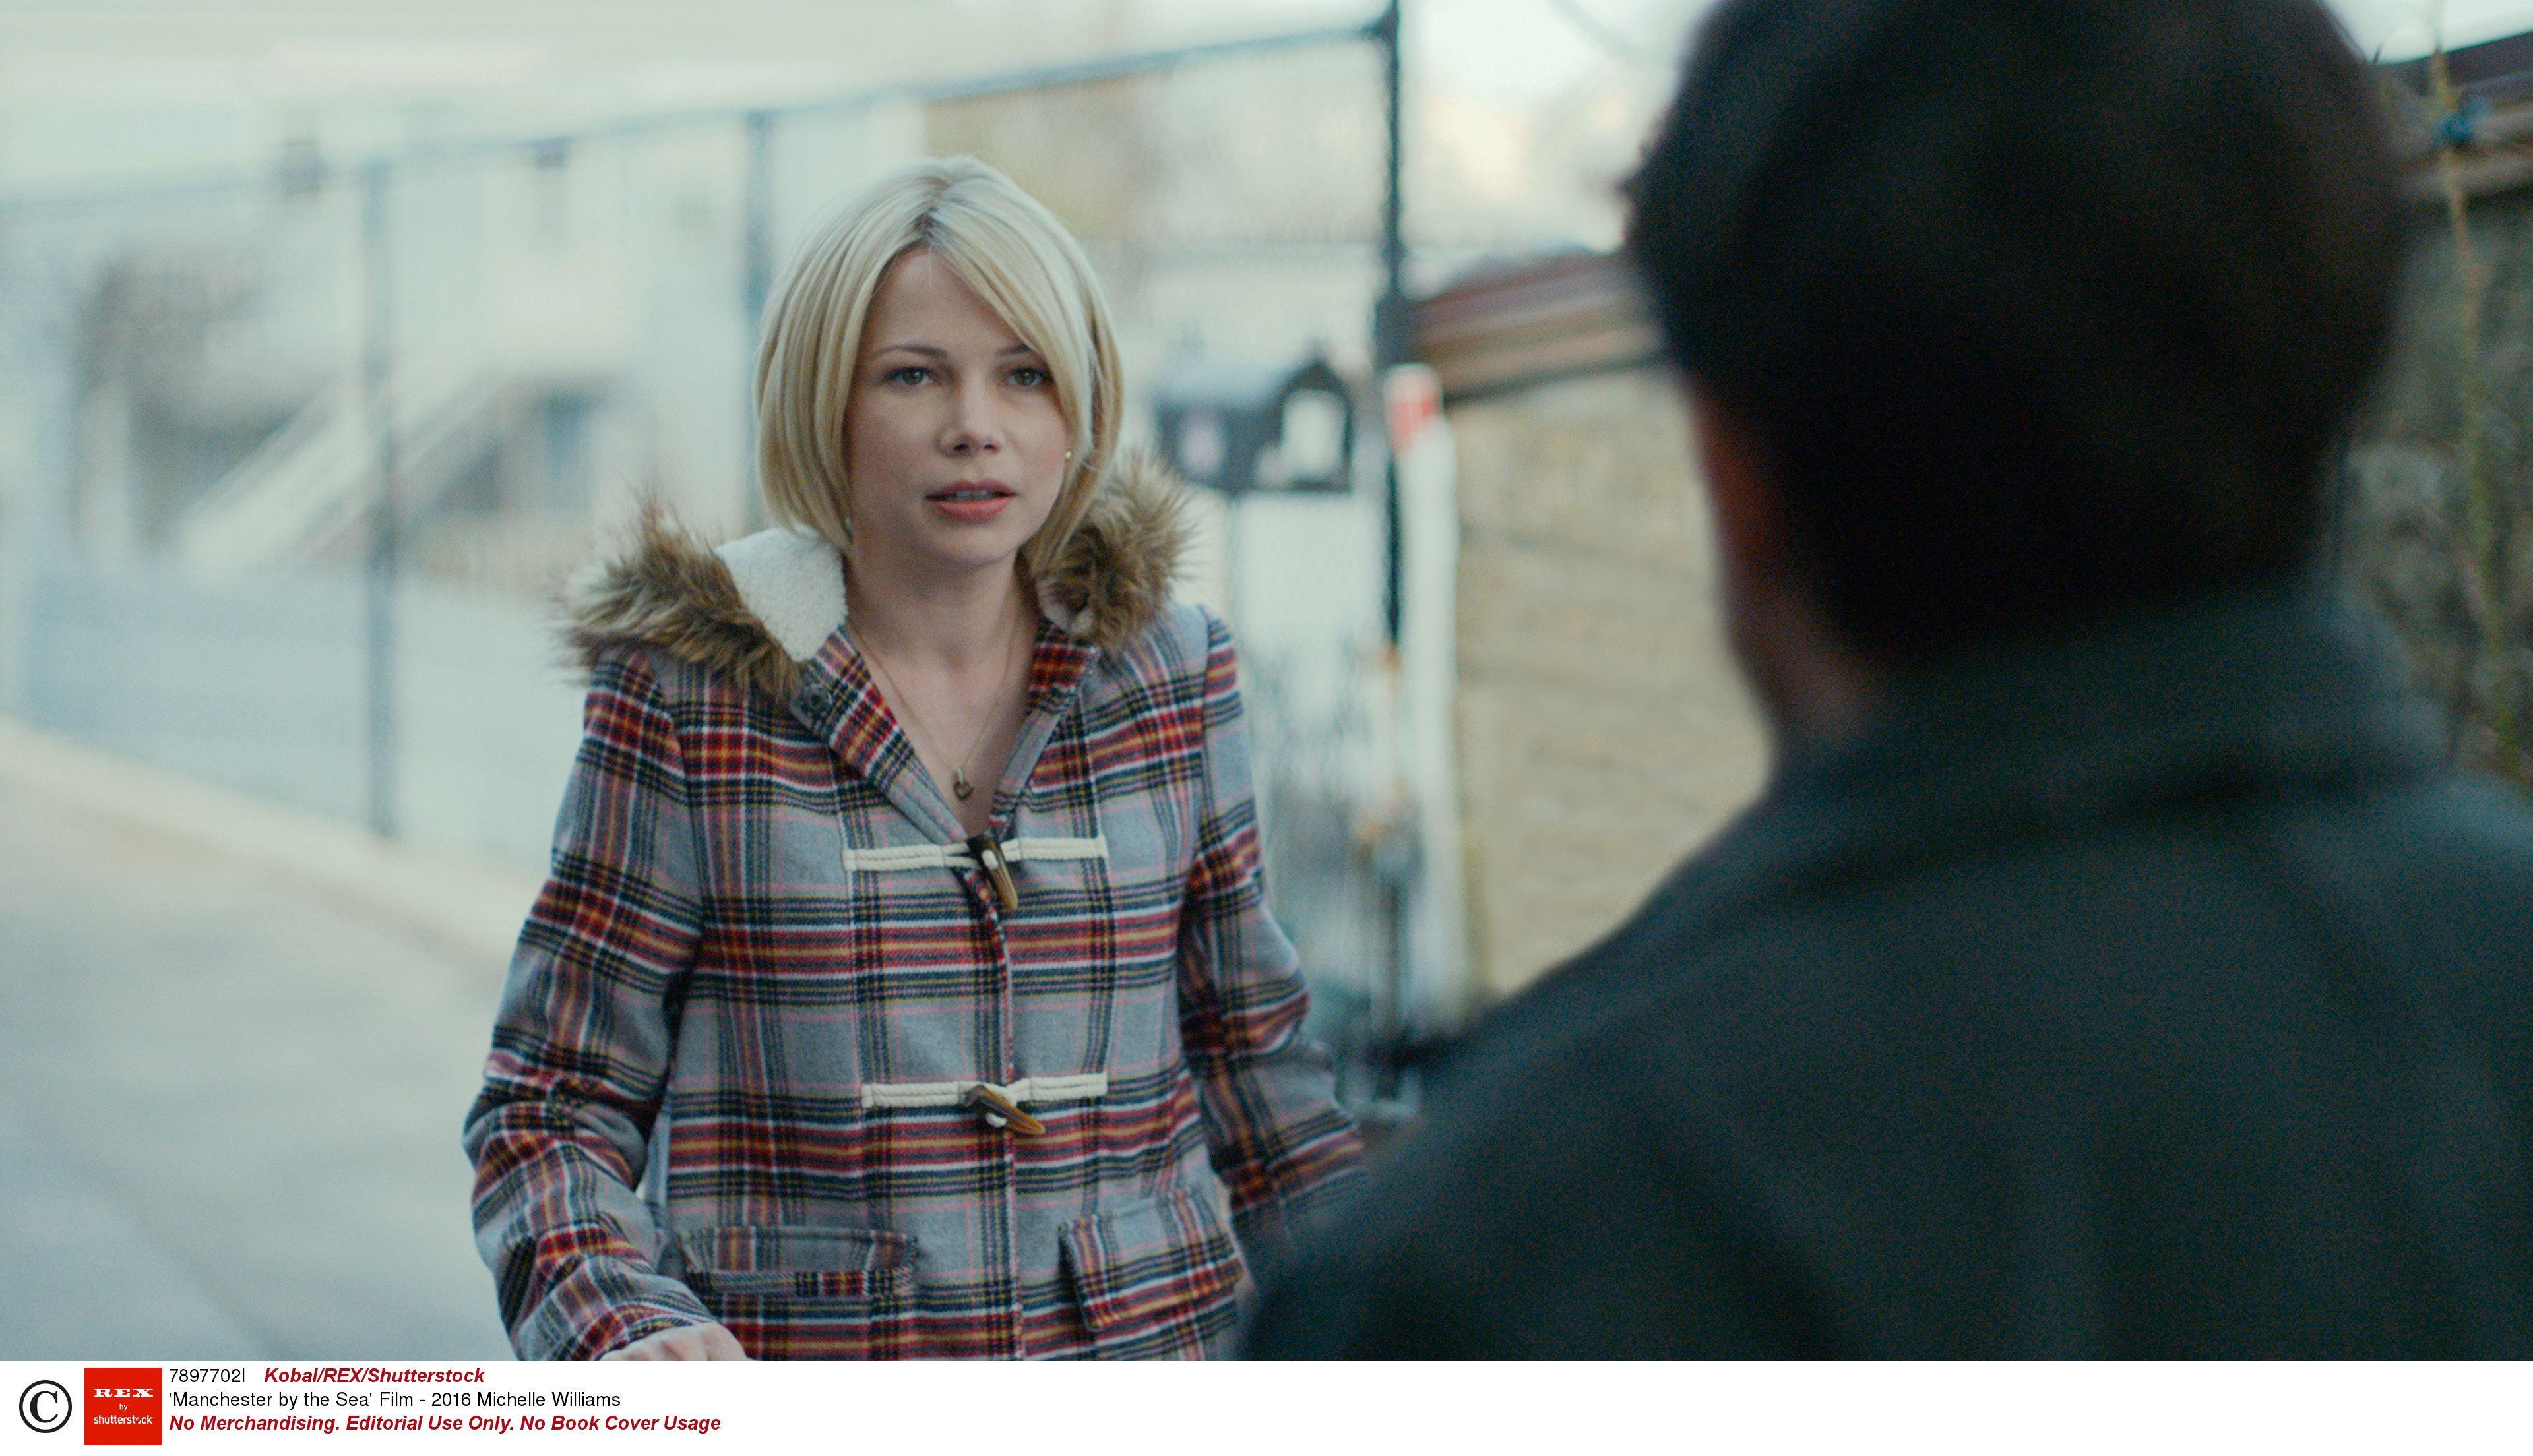 Michelle Williams在《海邊的曼徹斯特》與Casey Affleck有精彩的對手戲。